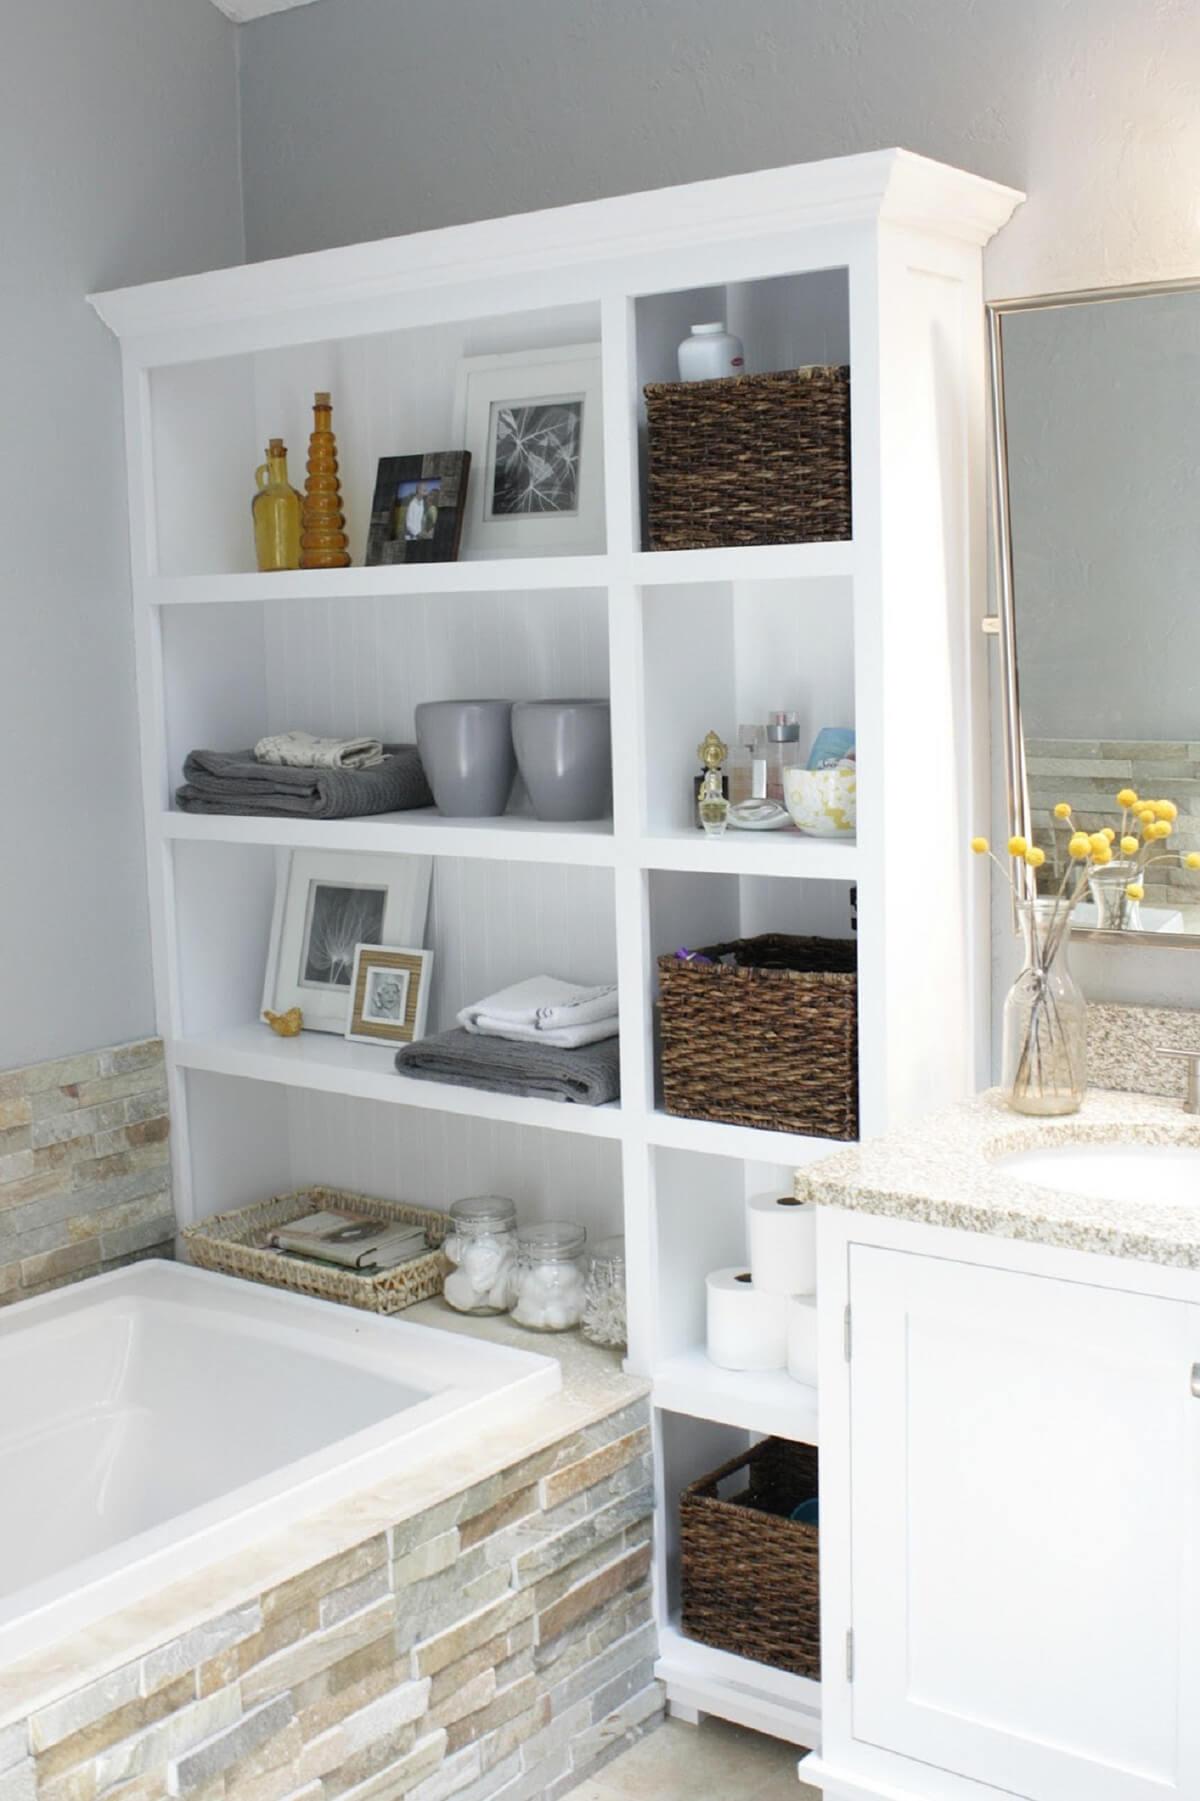 28-small-bathroom-storage-ideas-homebnc